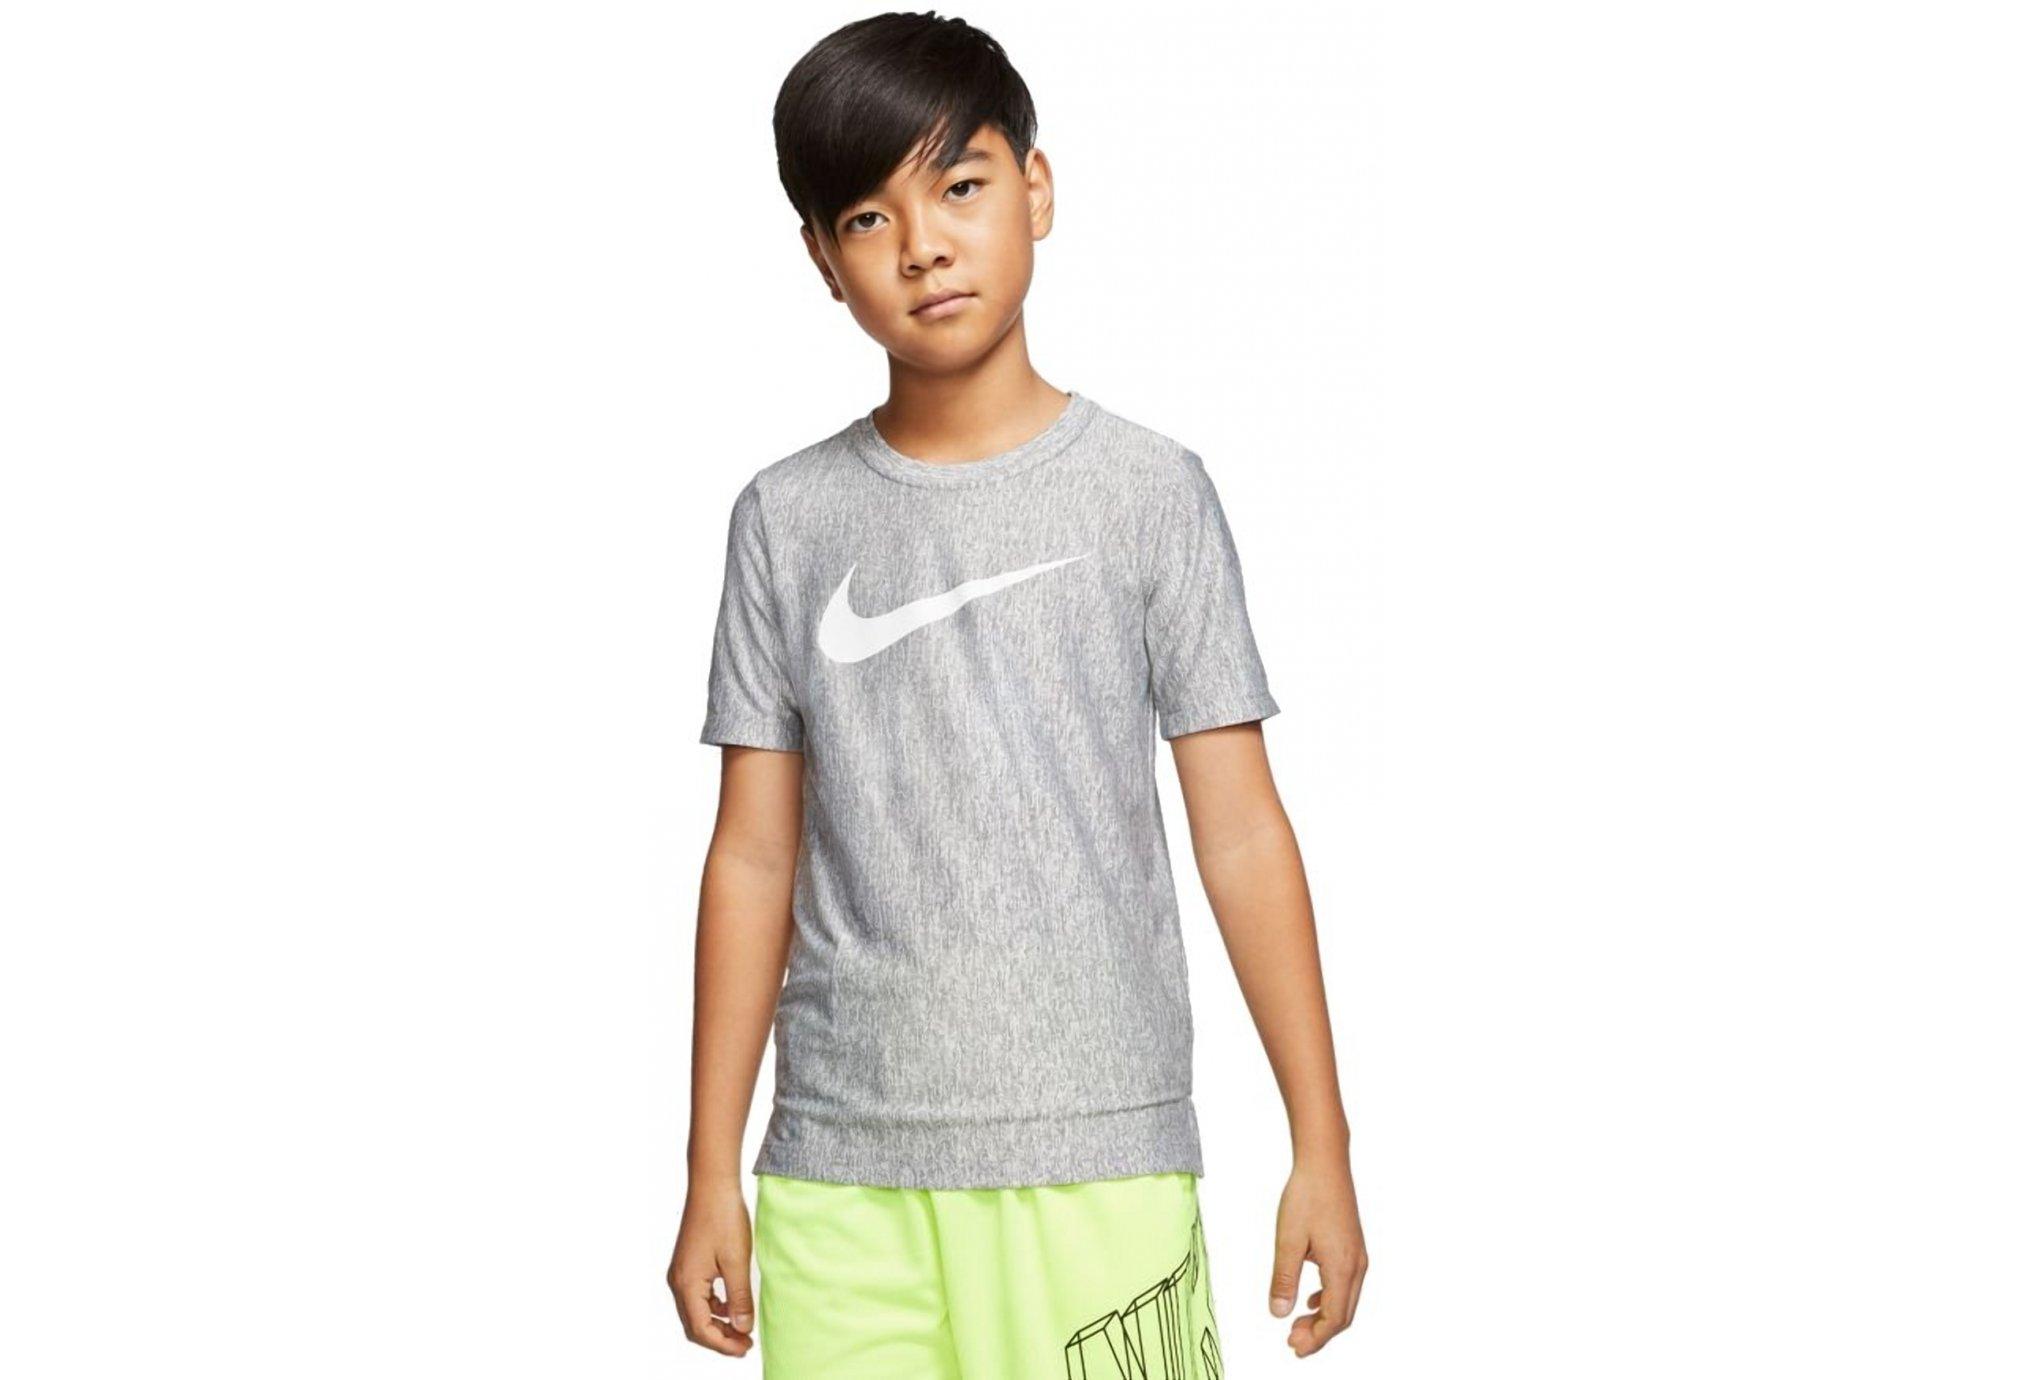 Nike Core Performance Heather Junior vêtement running homme